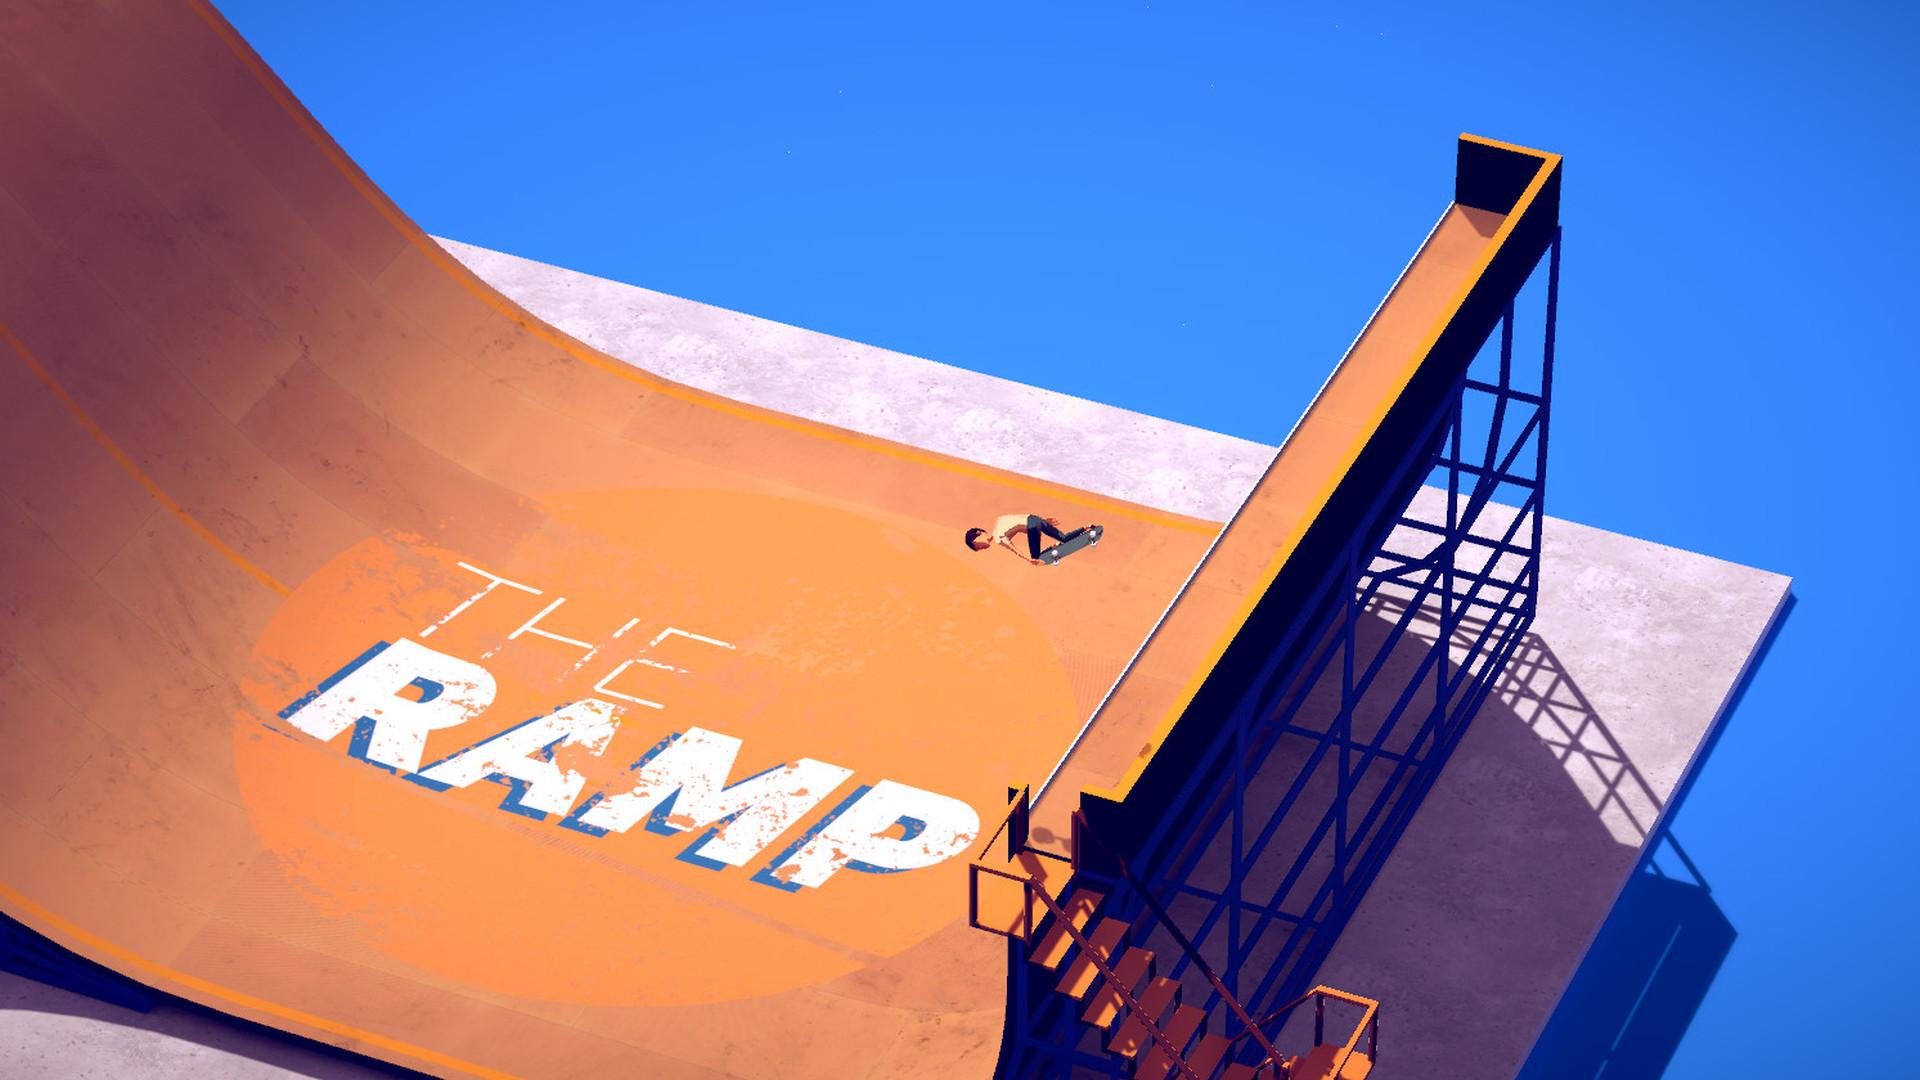 The Ramp | Hyperparadise